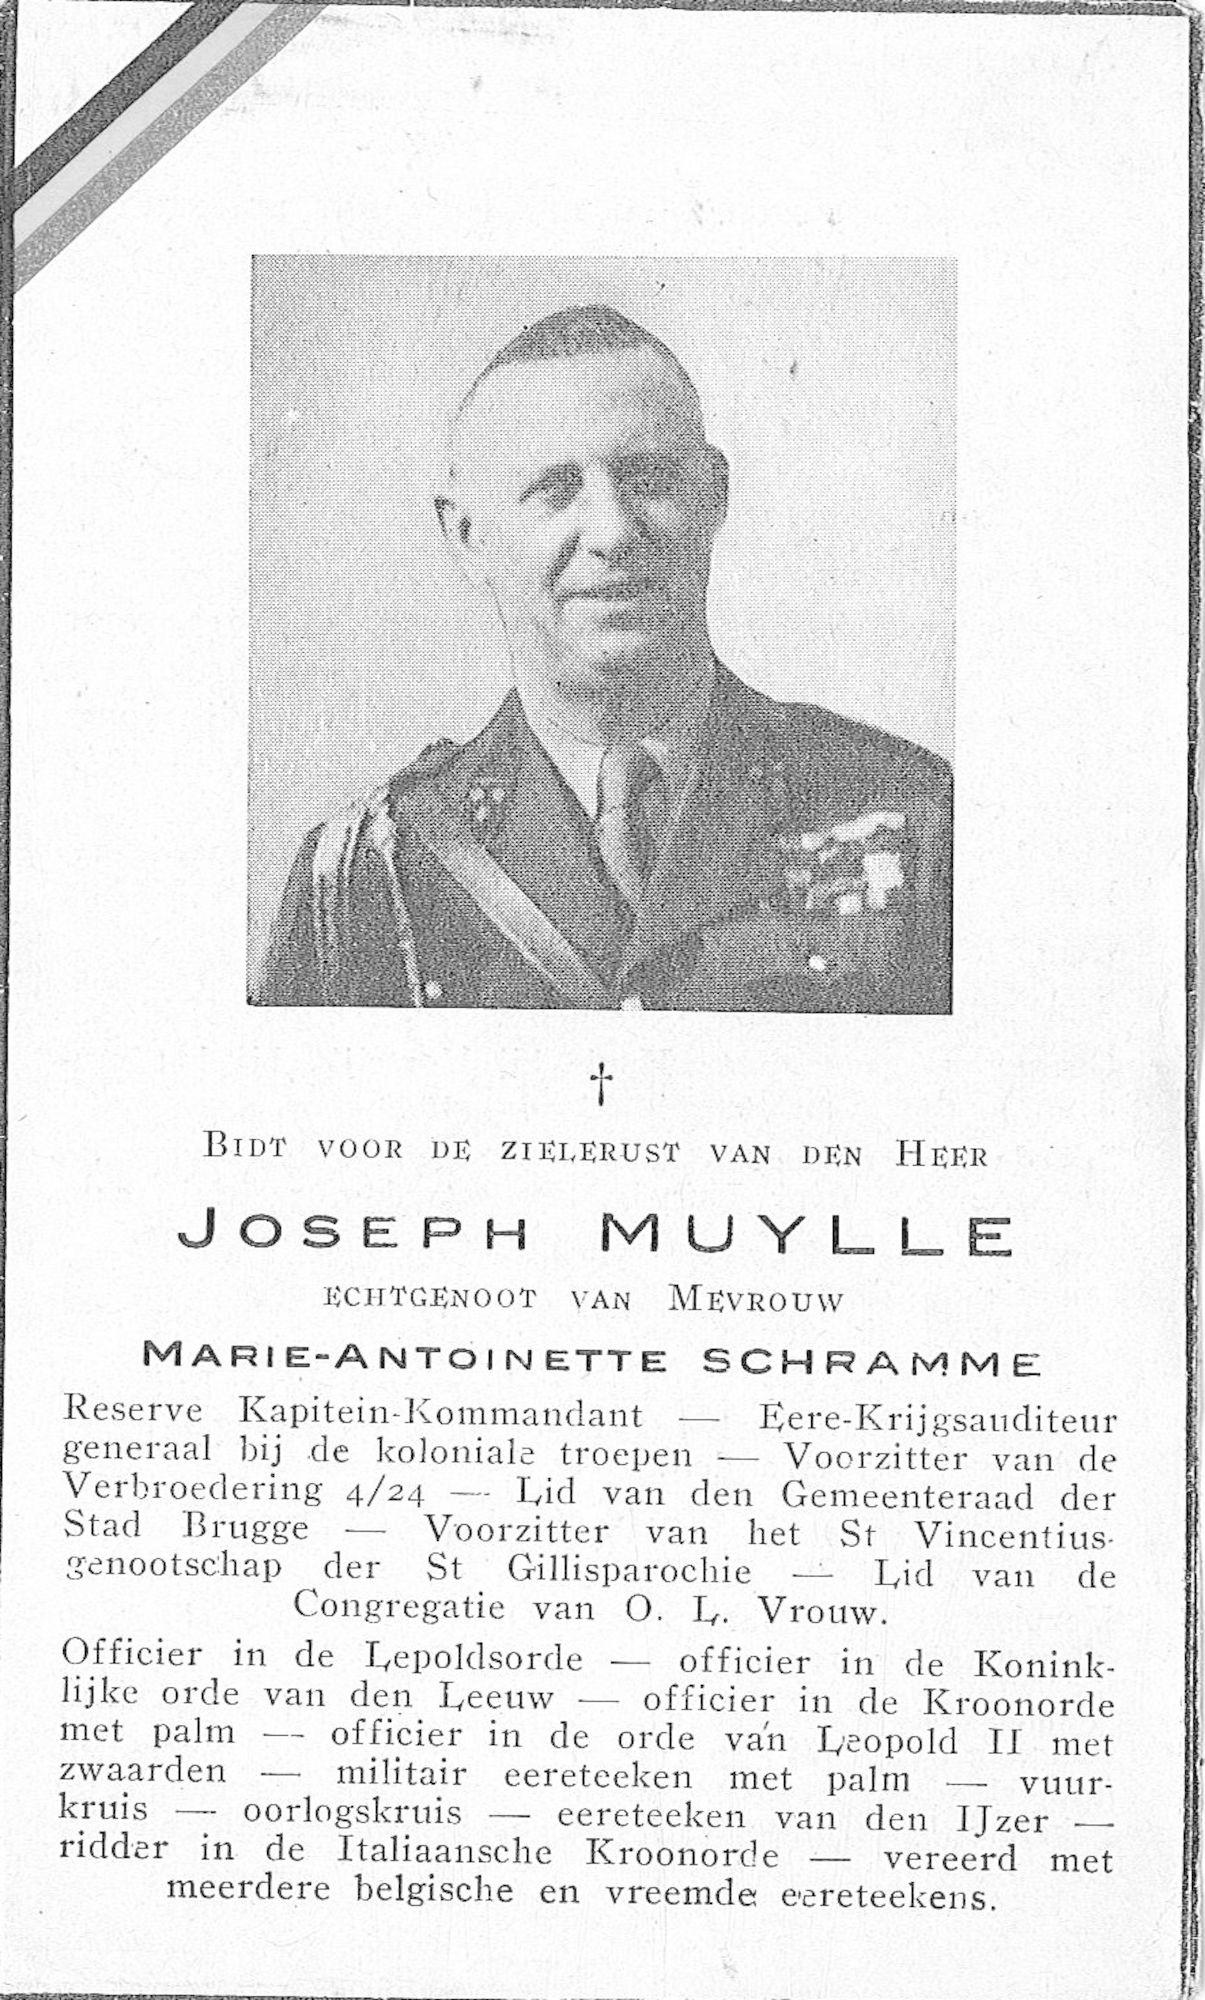 Joseph Muylle